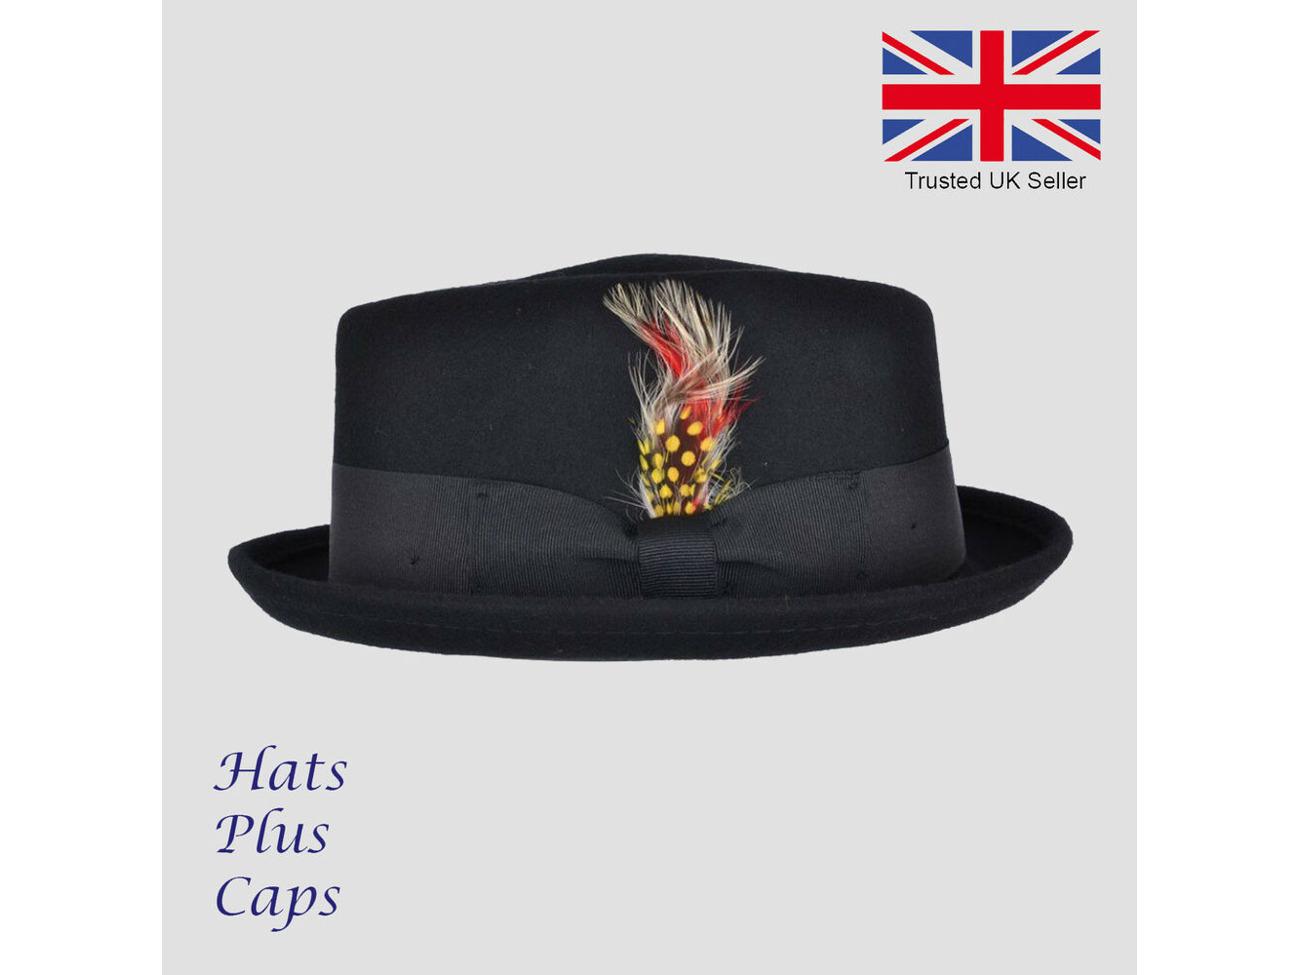 e5fd46ca Buy Pork Pie Hat Handmade 100% Wool Diamond Crown Breaking Bad Heisenberg  Trilby Hat | Fat Llama